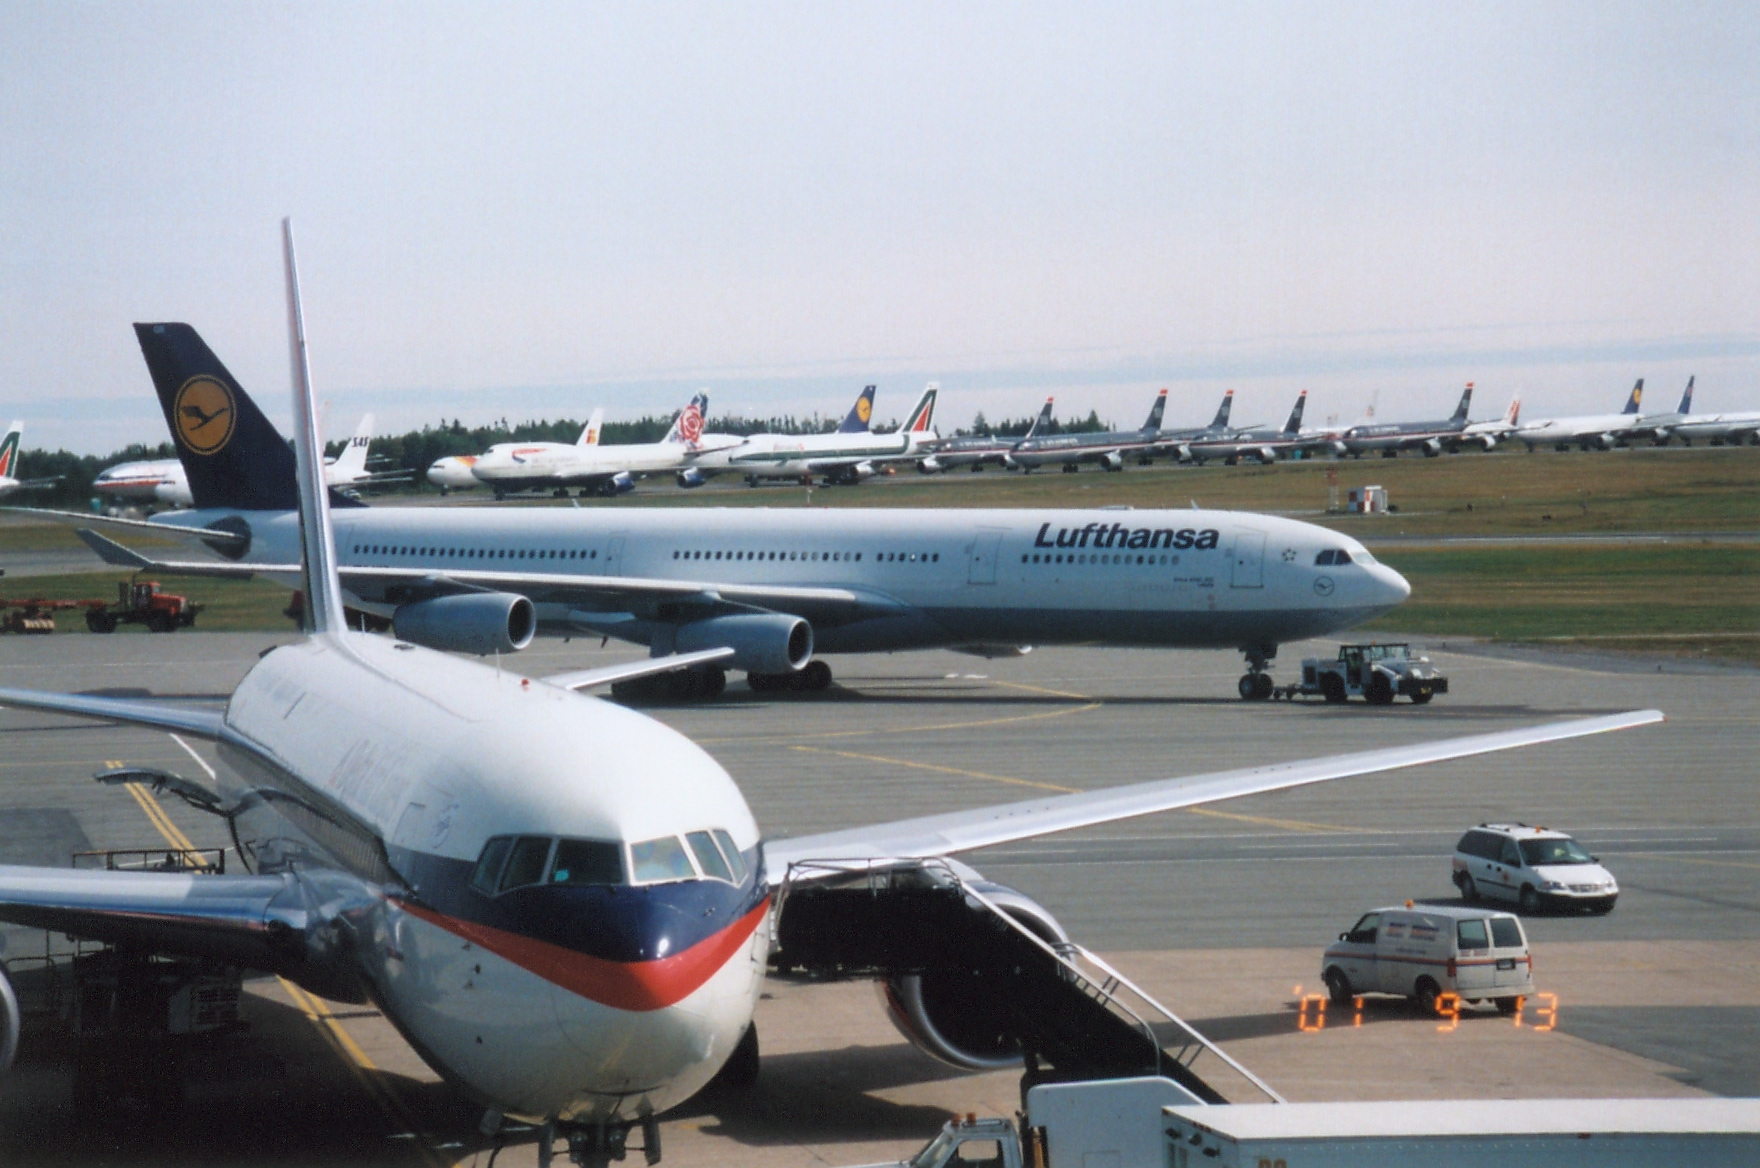 Halifax International Airport tog imod 47 af op imod 240 passagerfly. SAS-flyet kan skimtes bag Lufthansa-flyets hale. (Foto: Halifax International Airport Authority)